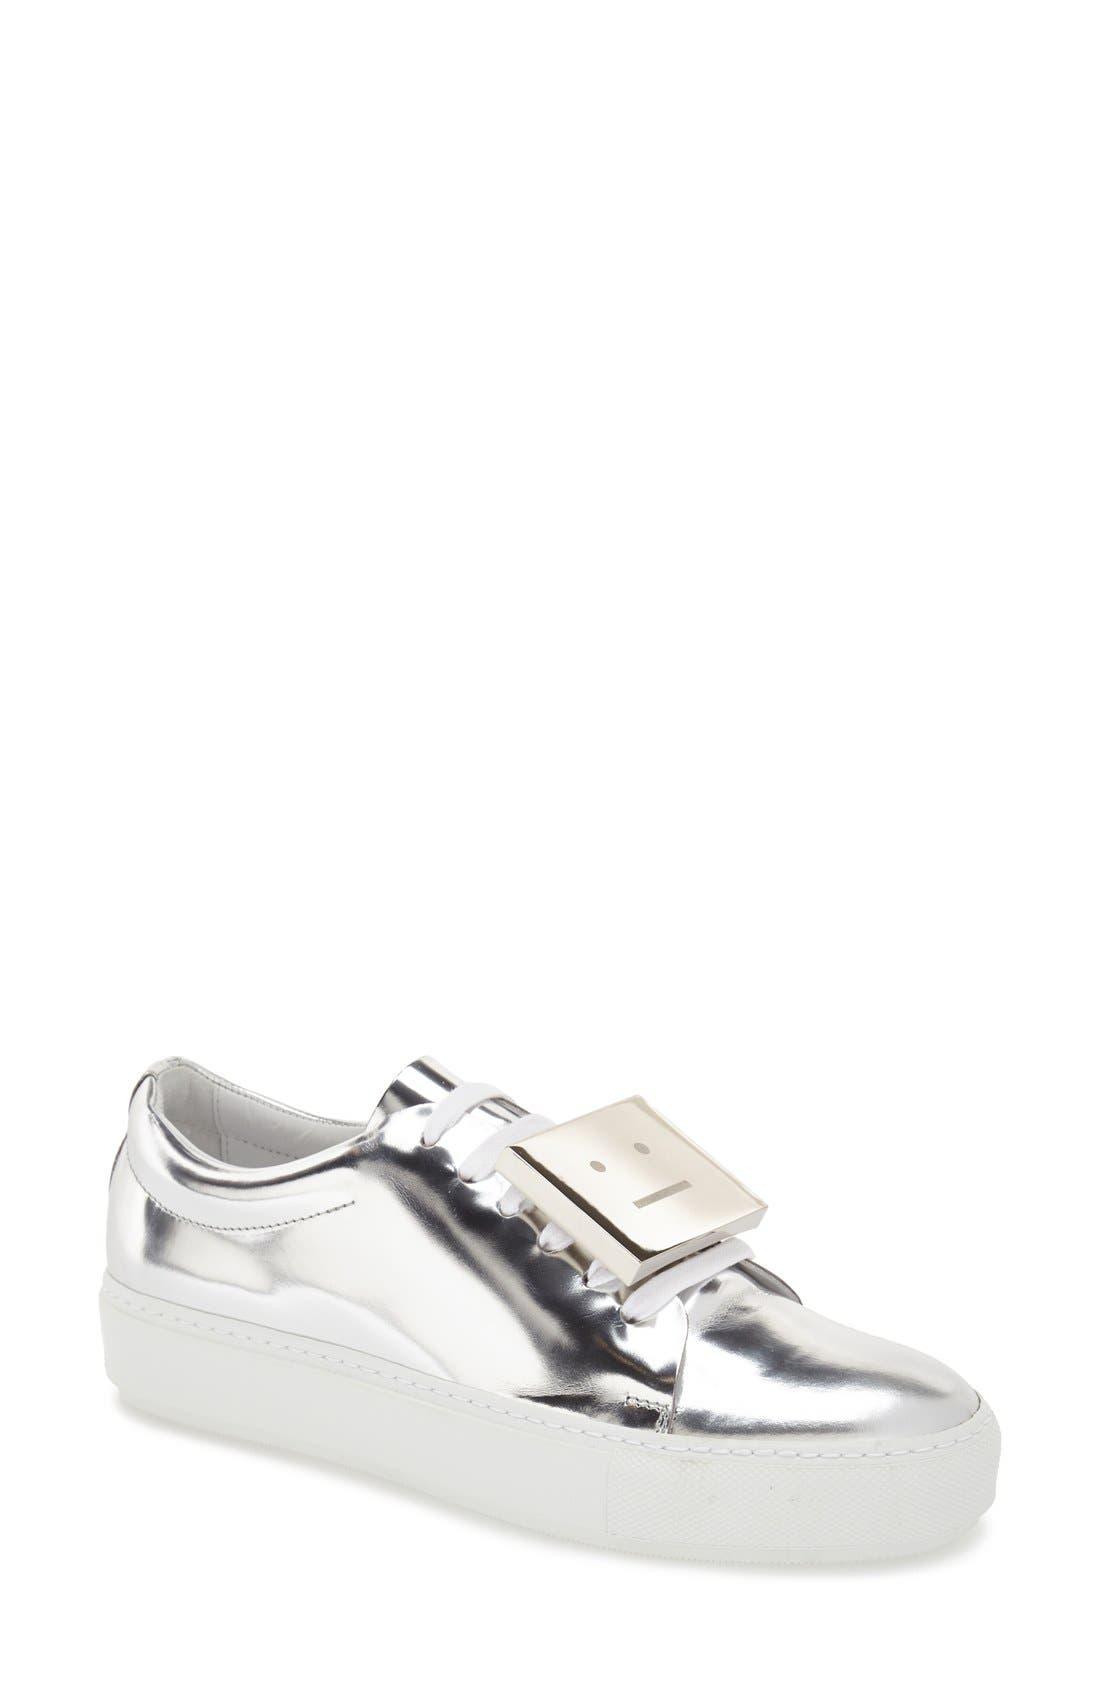 Main Image - ACNE Studios 'Adriana' Silver Metallic Sneaker (Women)